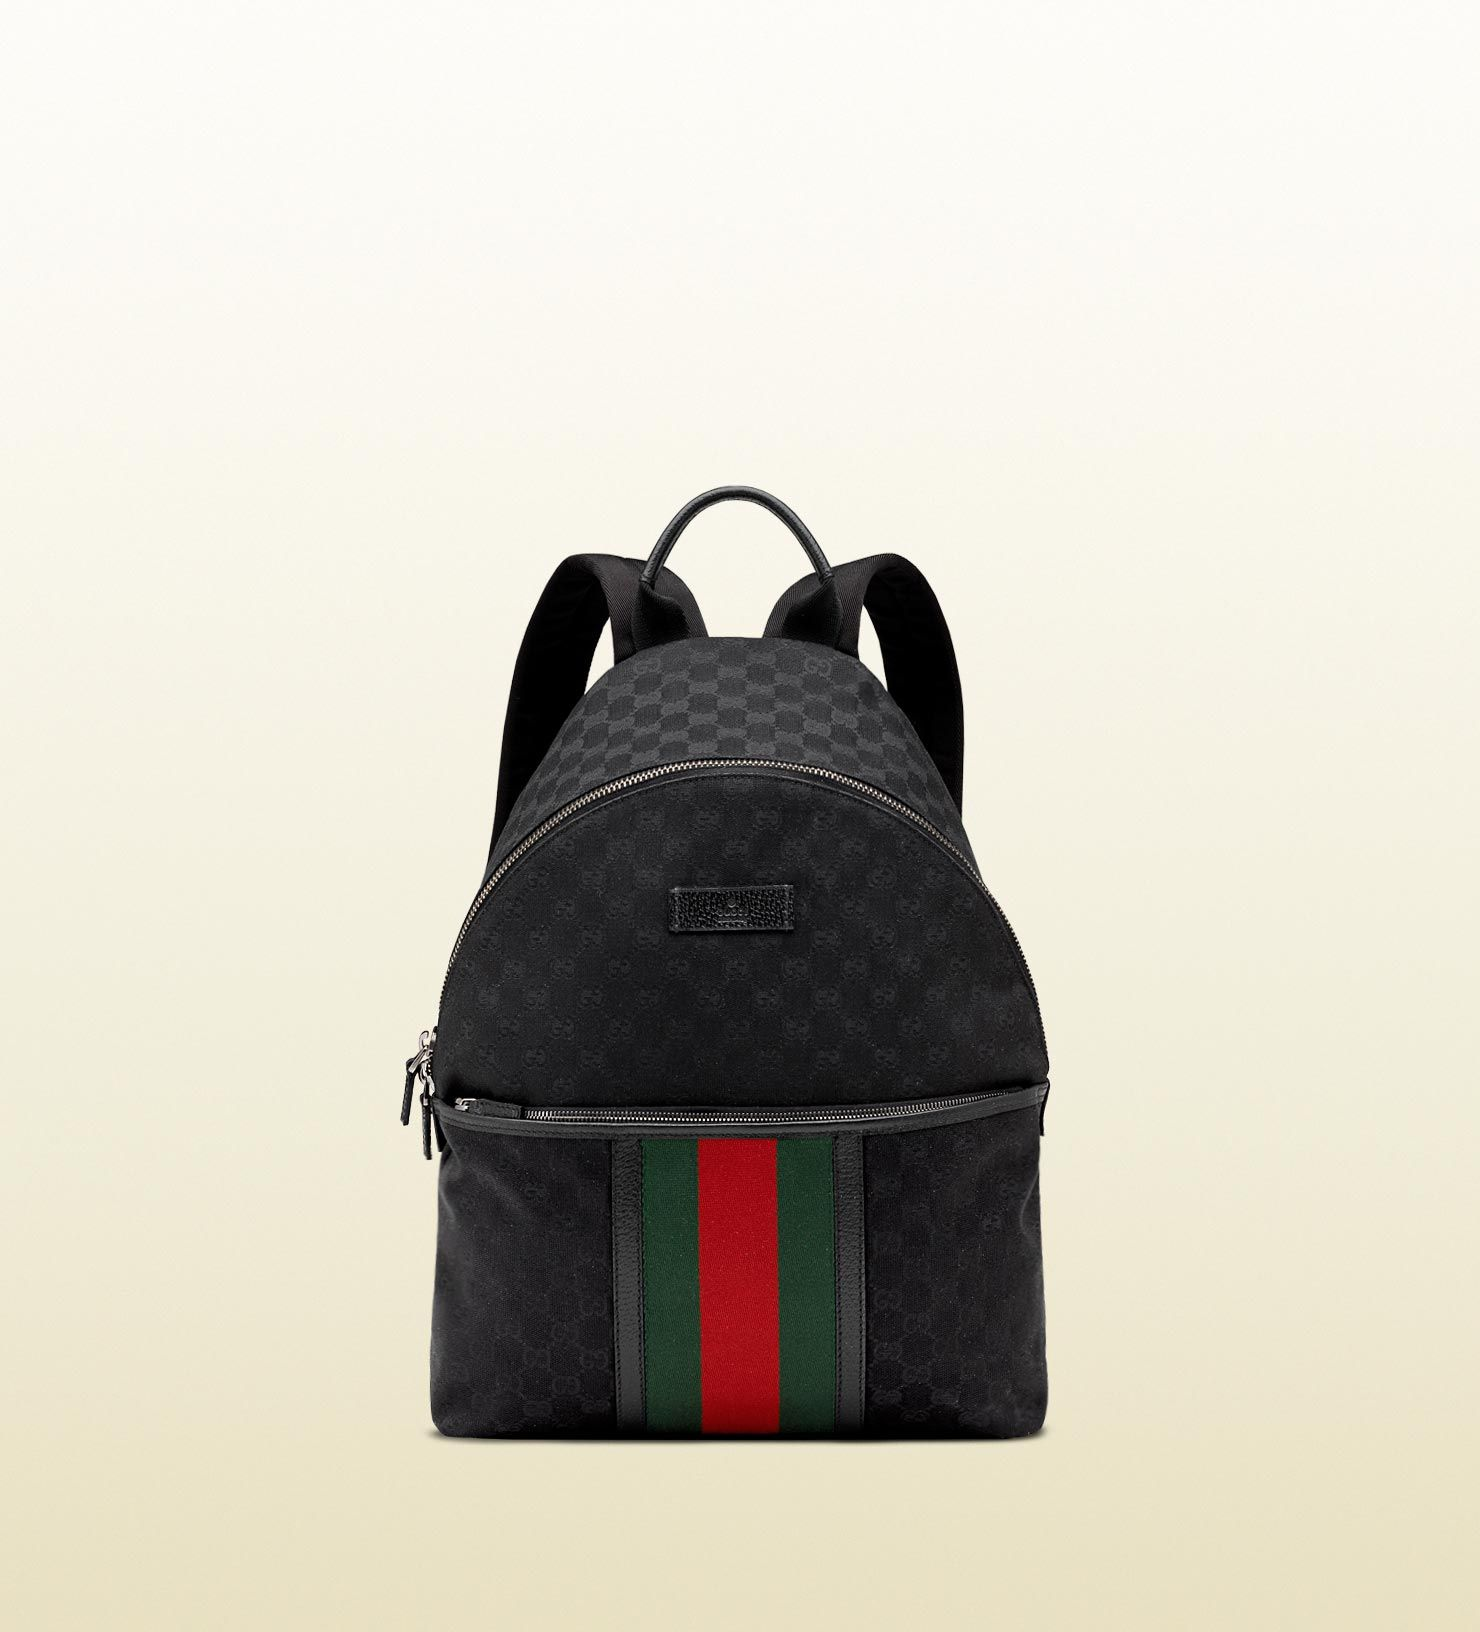 cb60b75ebb medium backpack w  classic double G print and green red green web ...